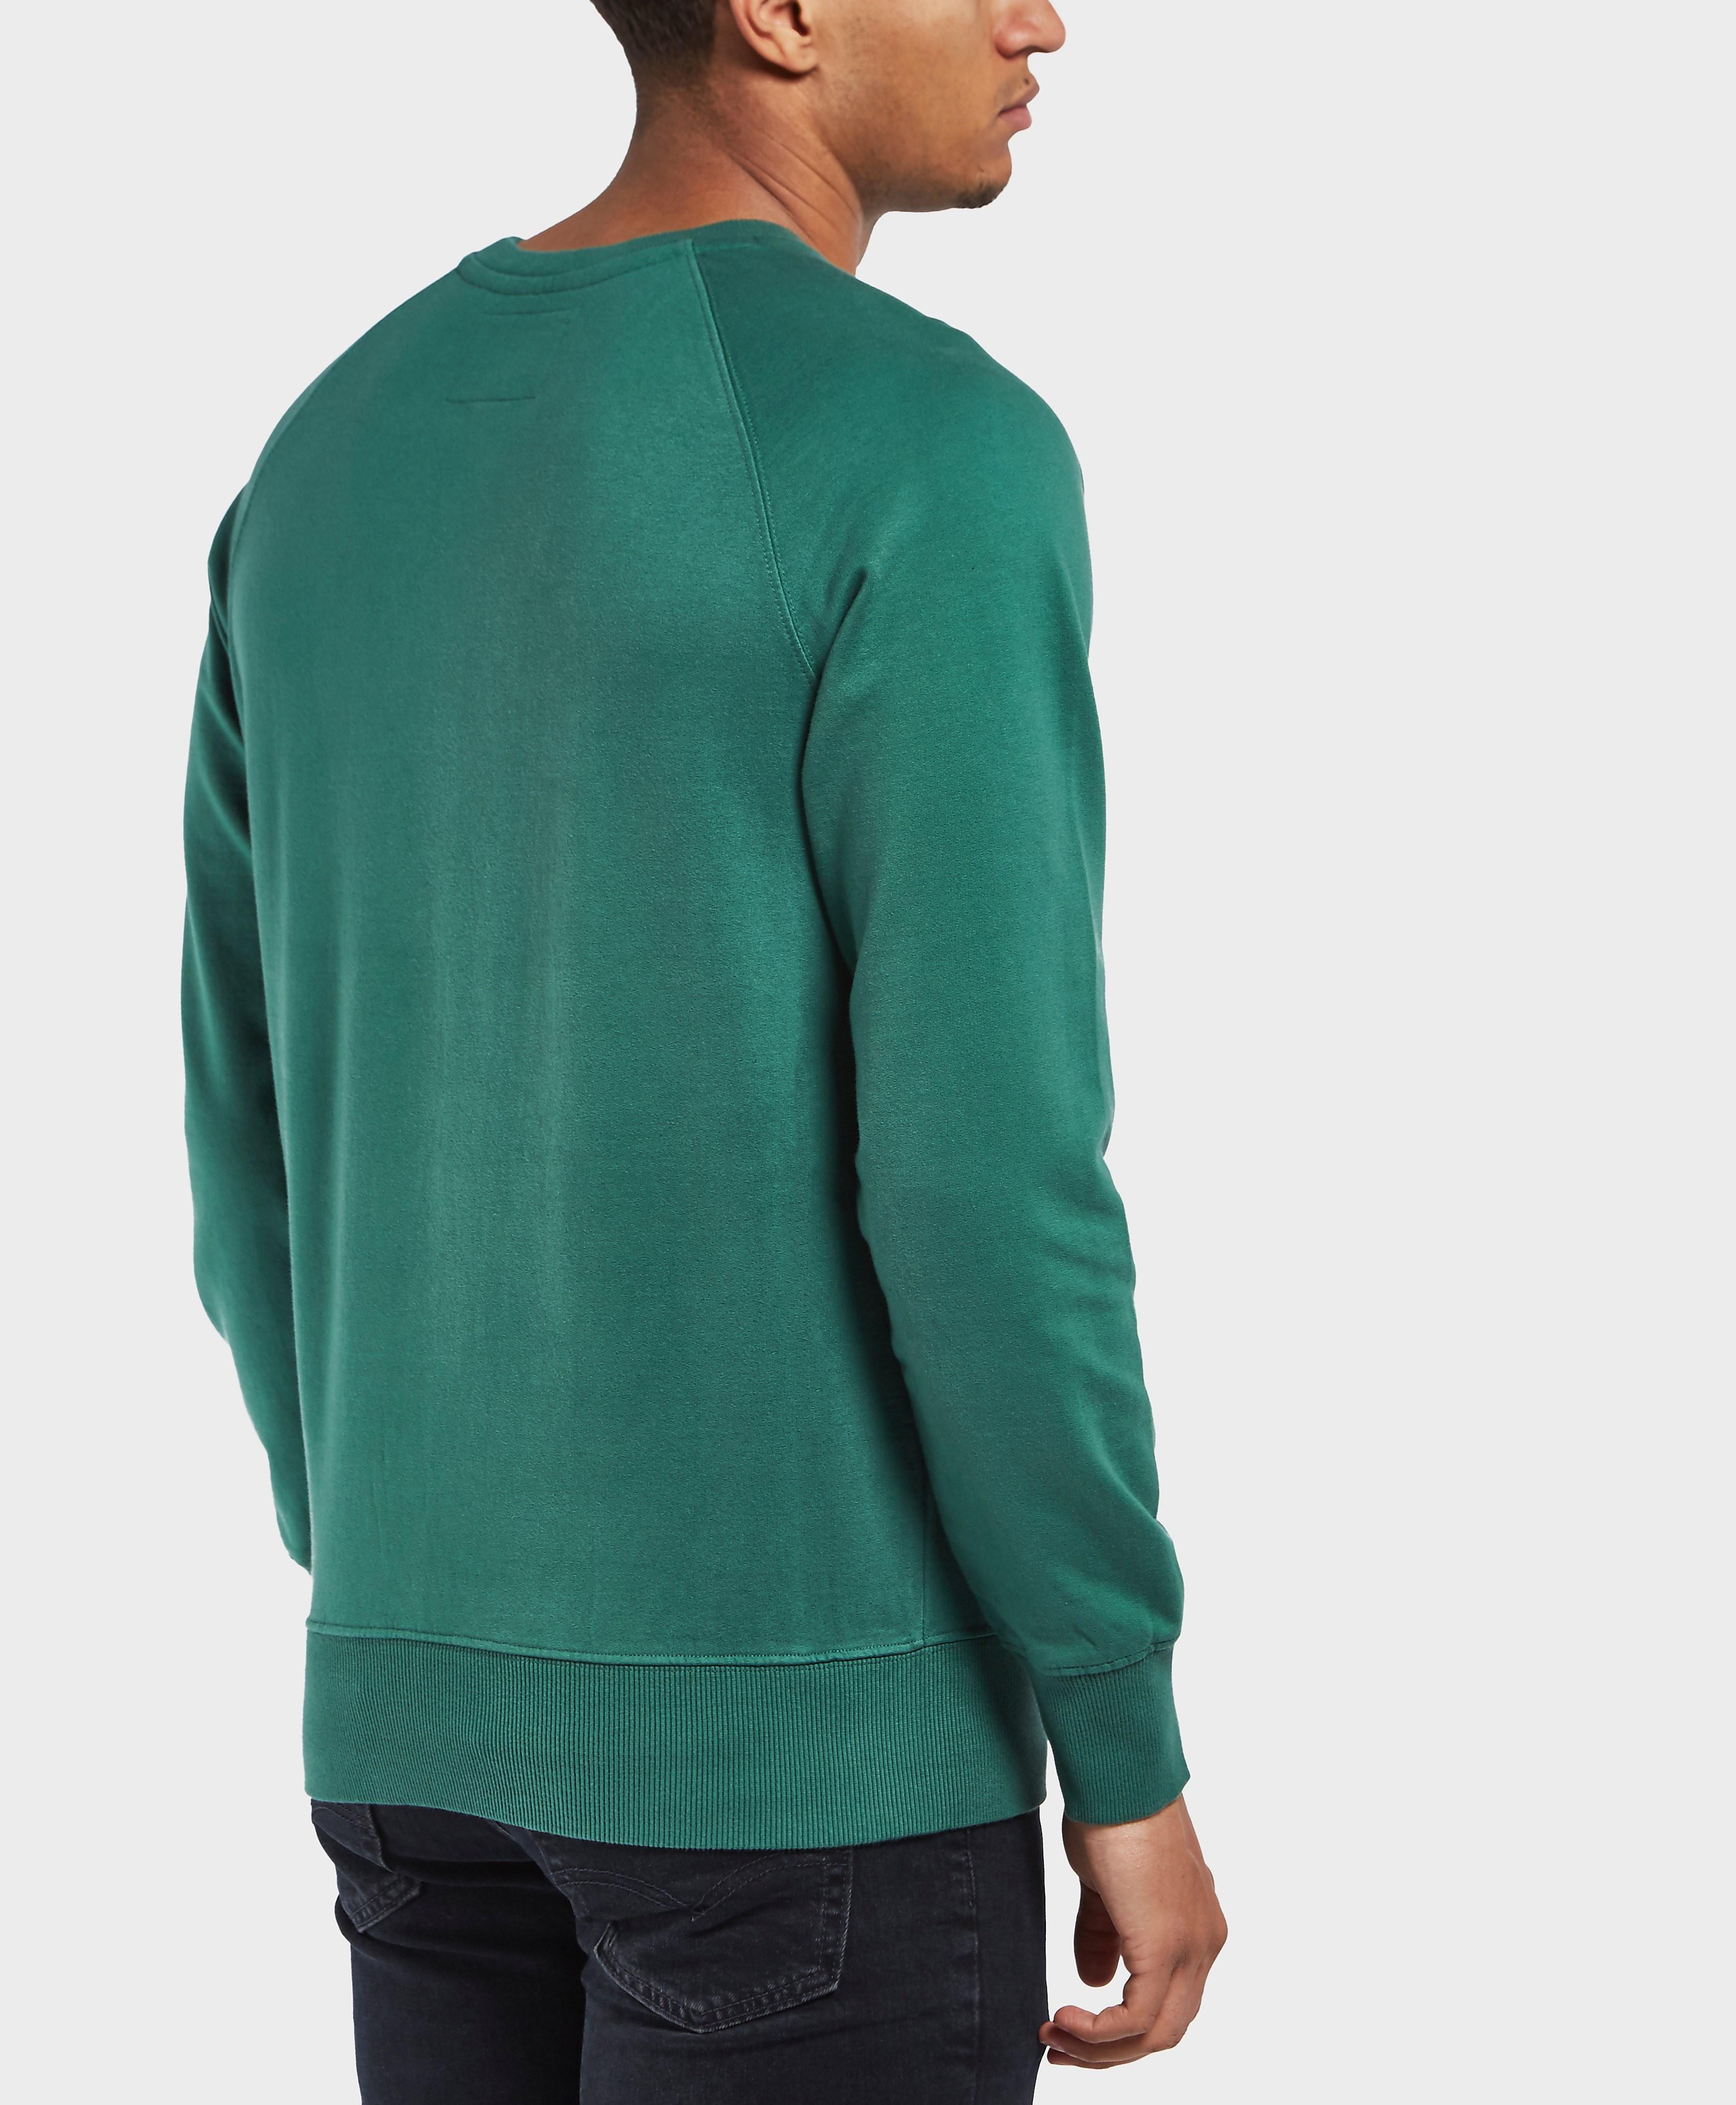 Diadora Crew Sweatshirt